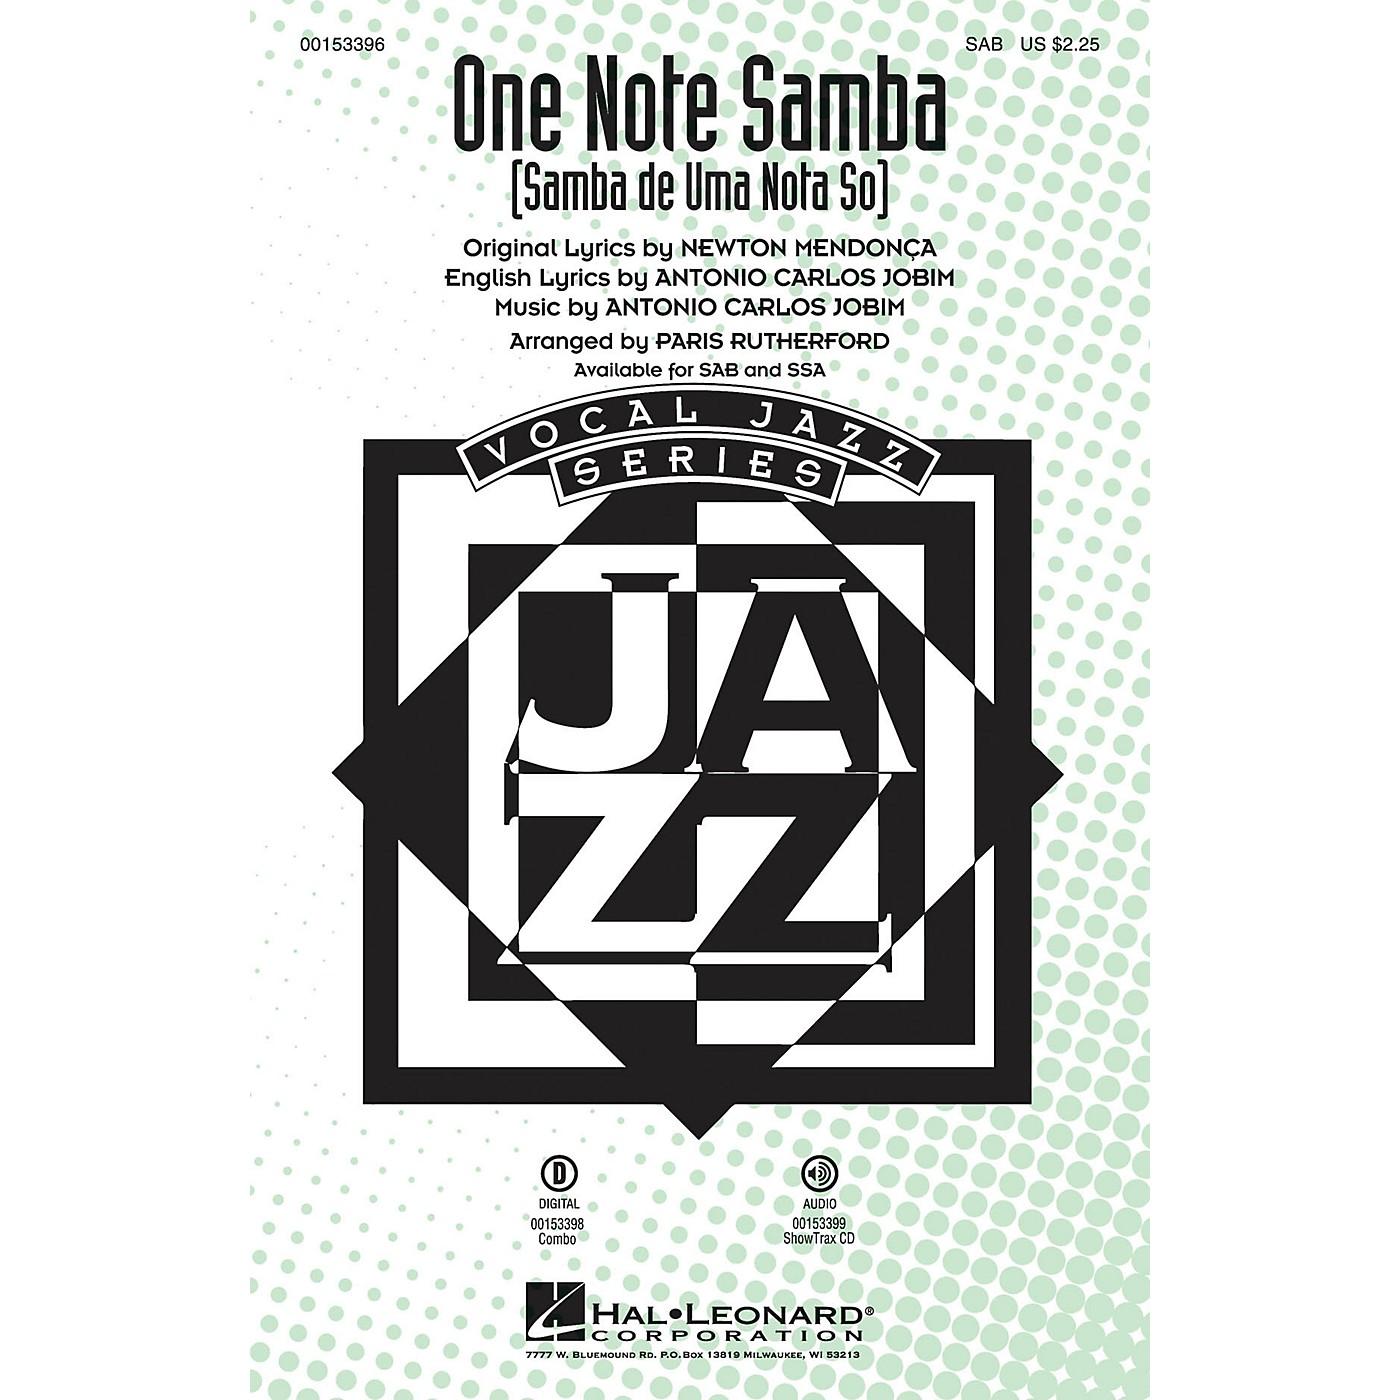 Hal Leonard One Note Samba (Samba de uma nota só) SSA Arranged by Paris Rutherford thumbnail